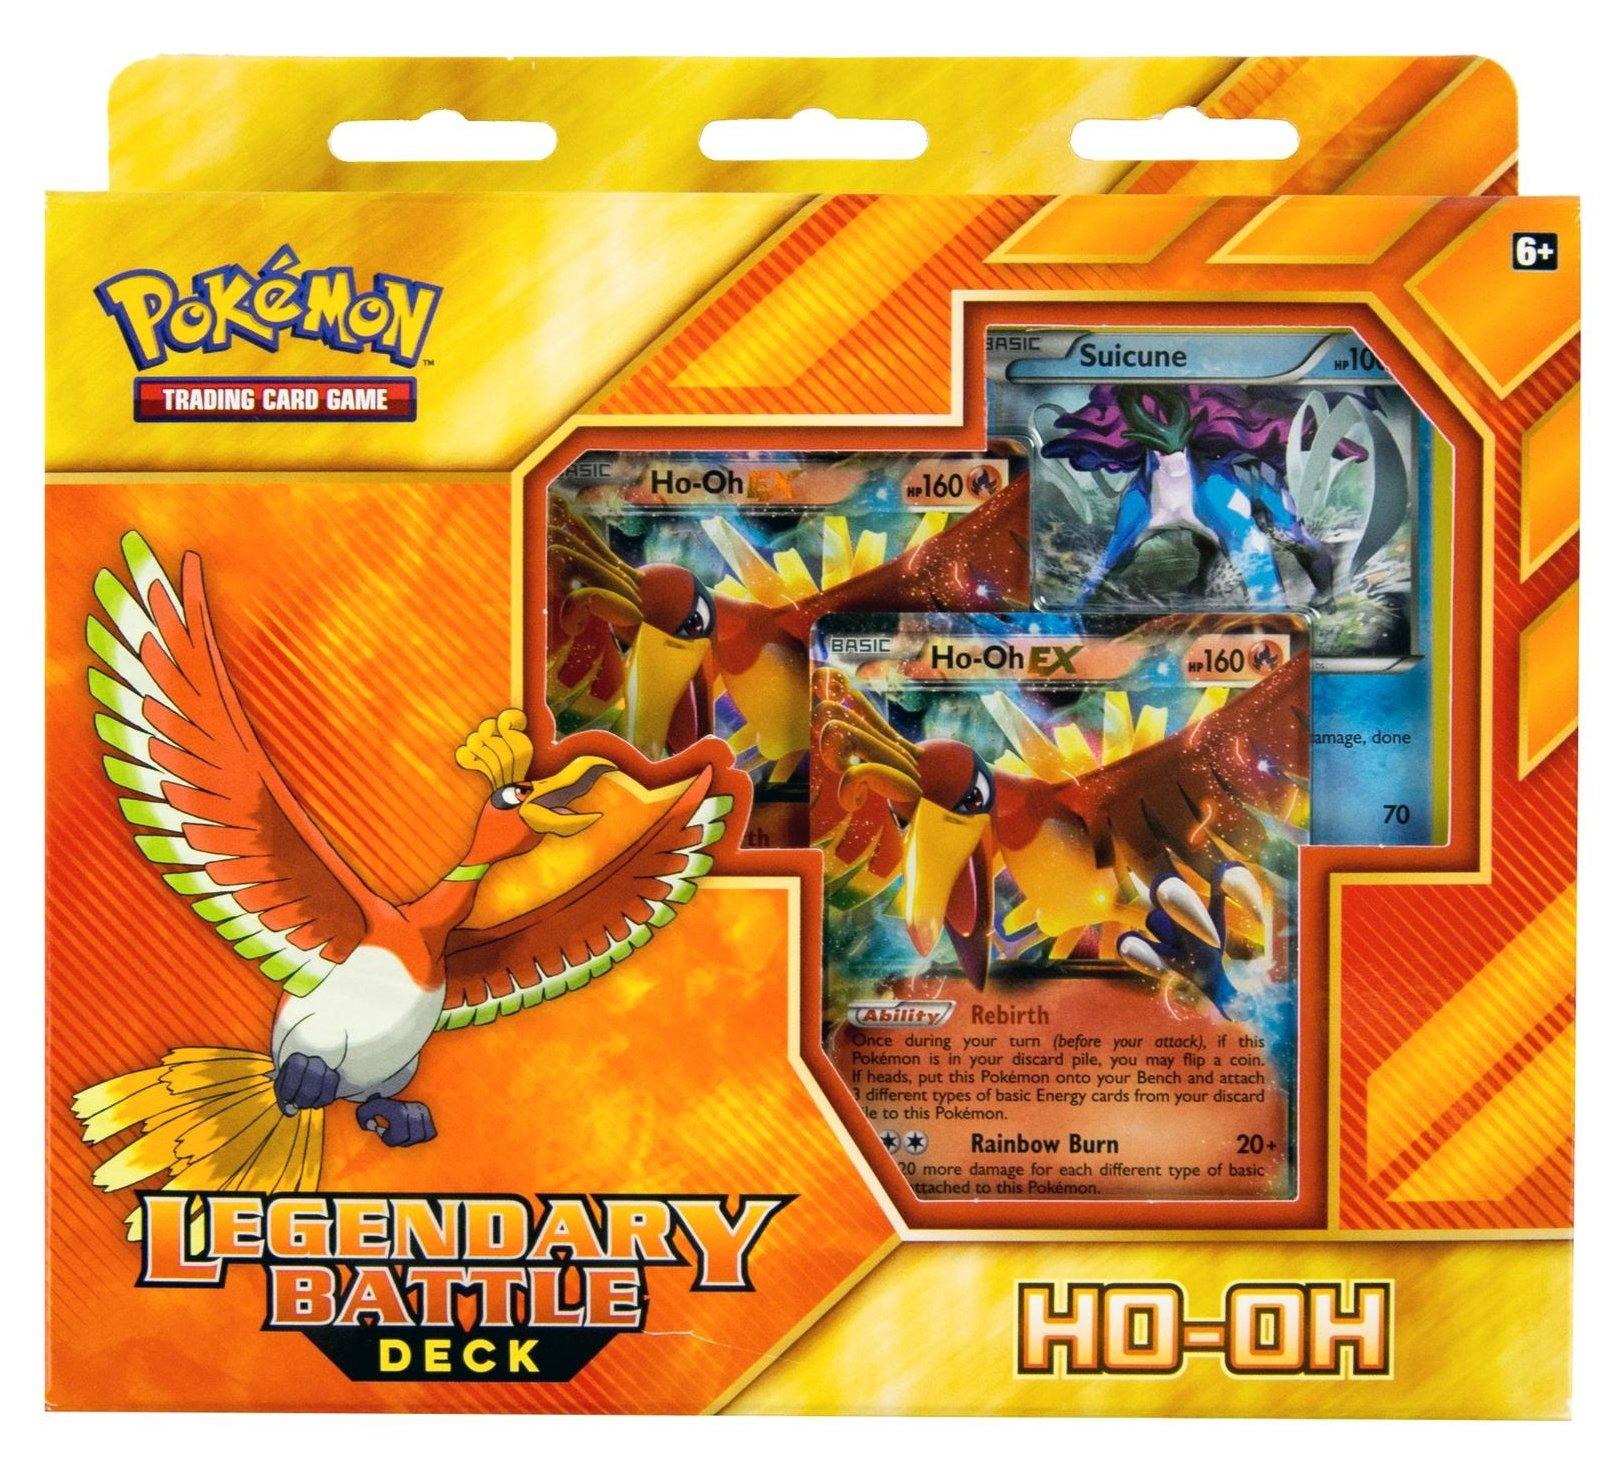 Pokemon TCG Legendary Battle Deck Ho-Oh by Pokémon